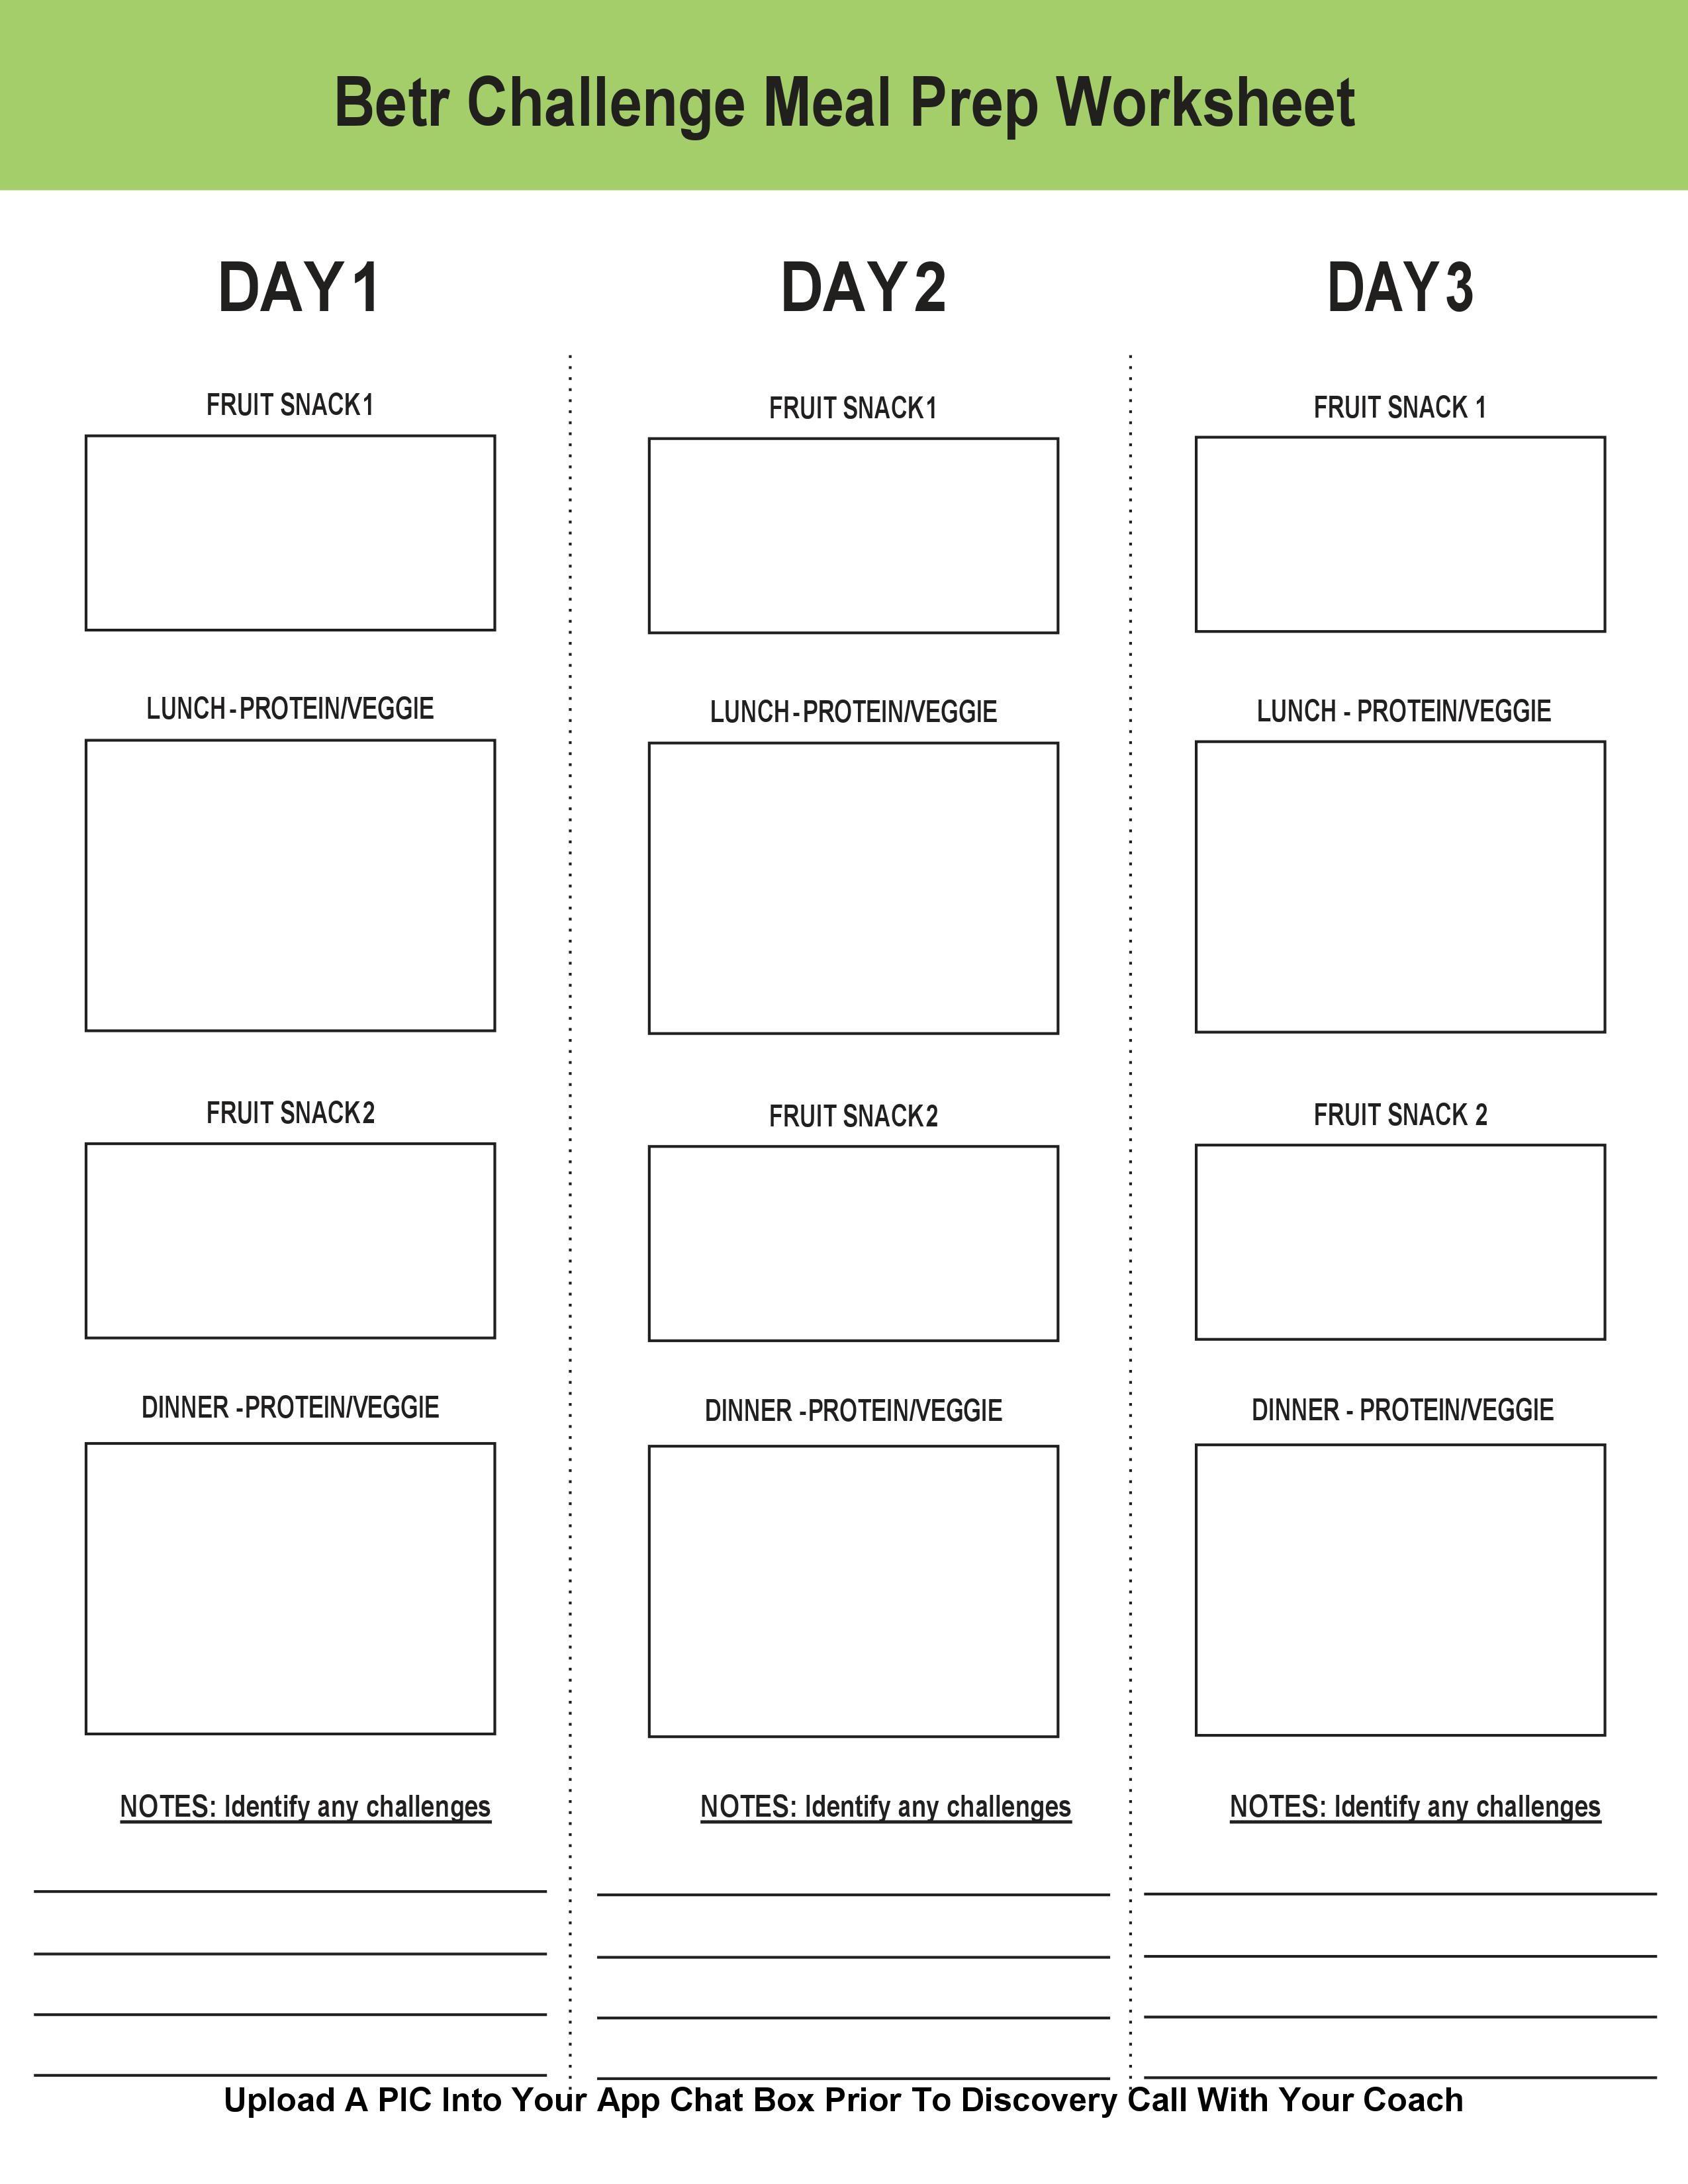 Meal Prep Planning Worksheet